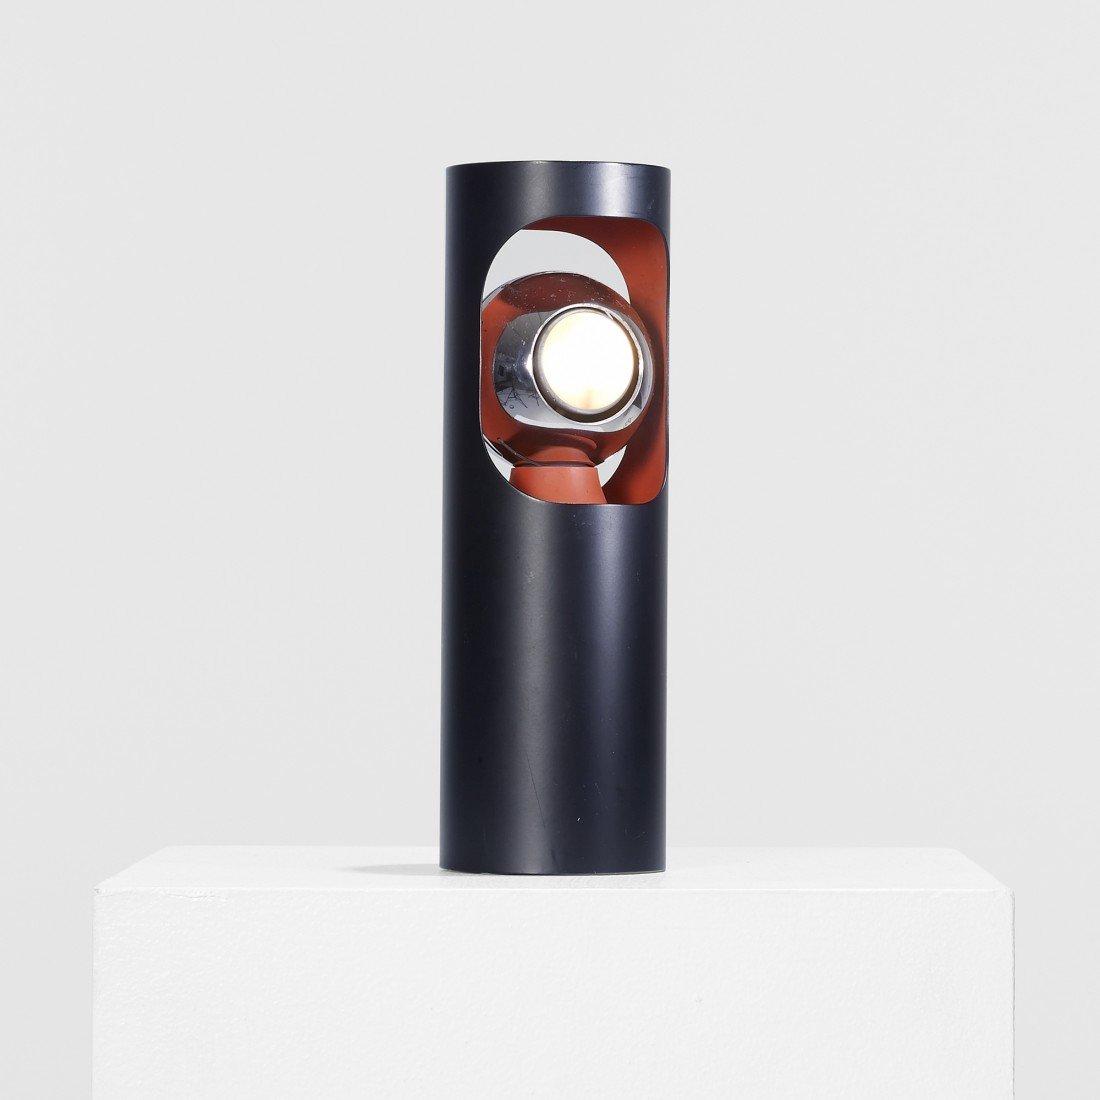 190: Angelo Lelli table lamp, model 13068